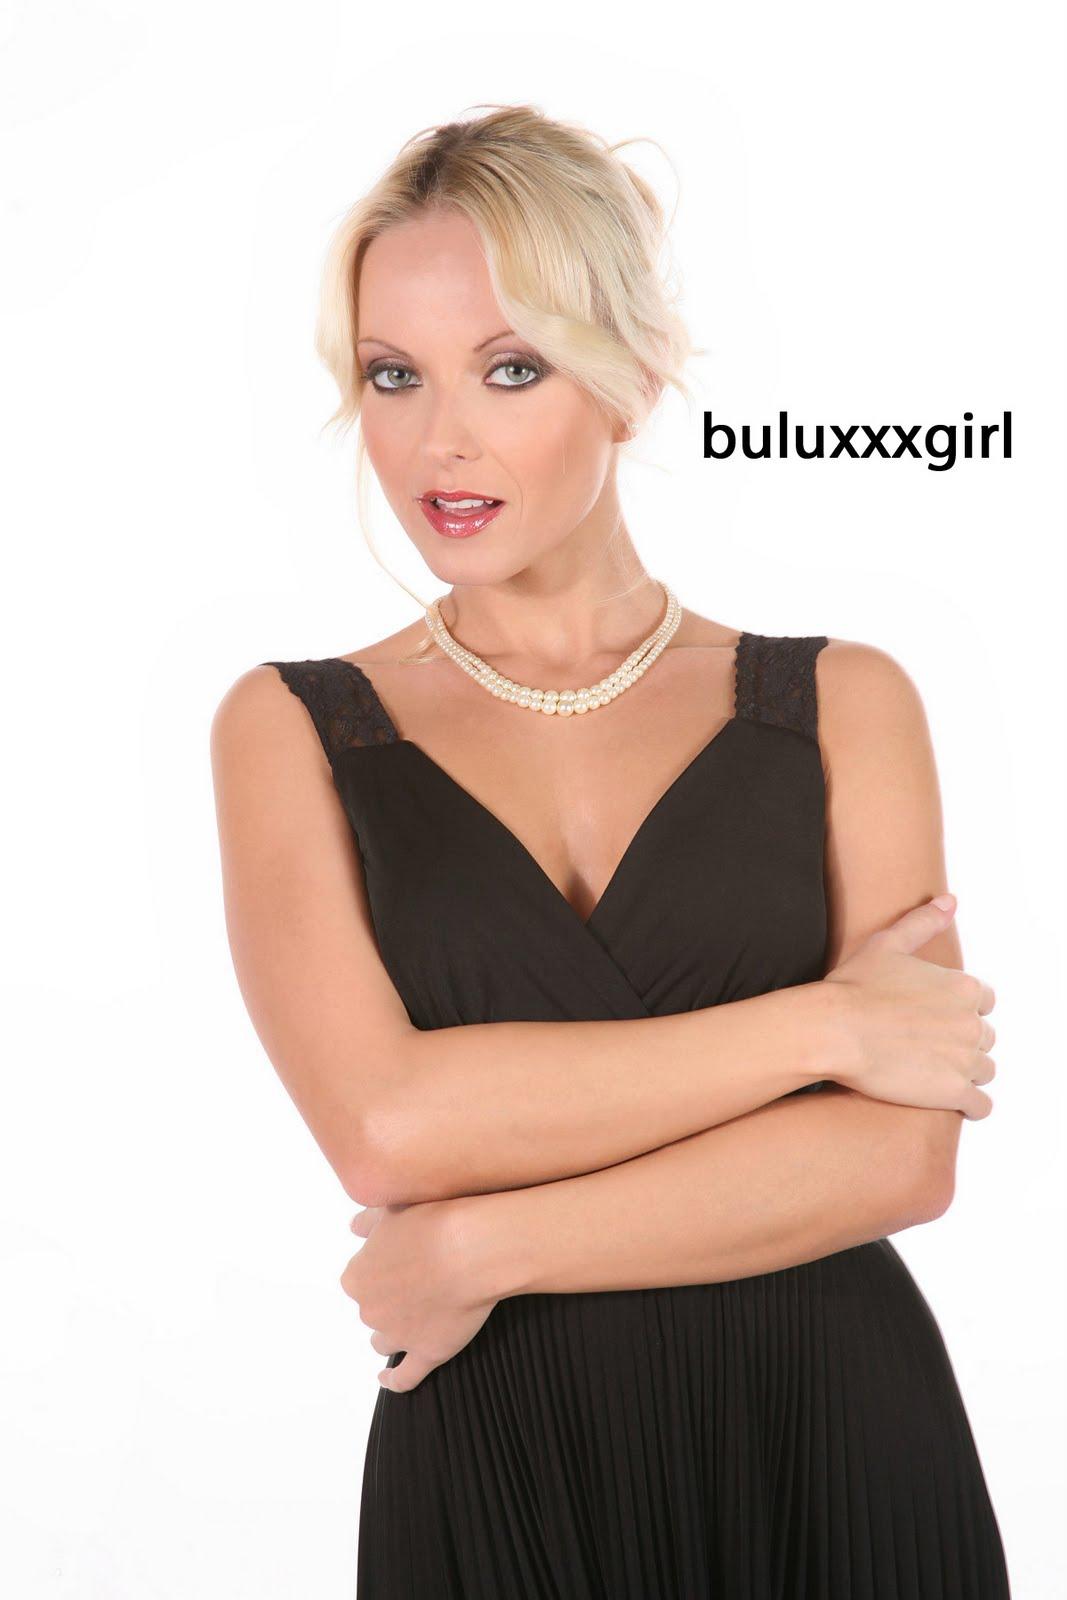 buluxxxgirl: Virtual babe Jana Cova showing hot striptease